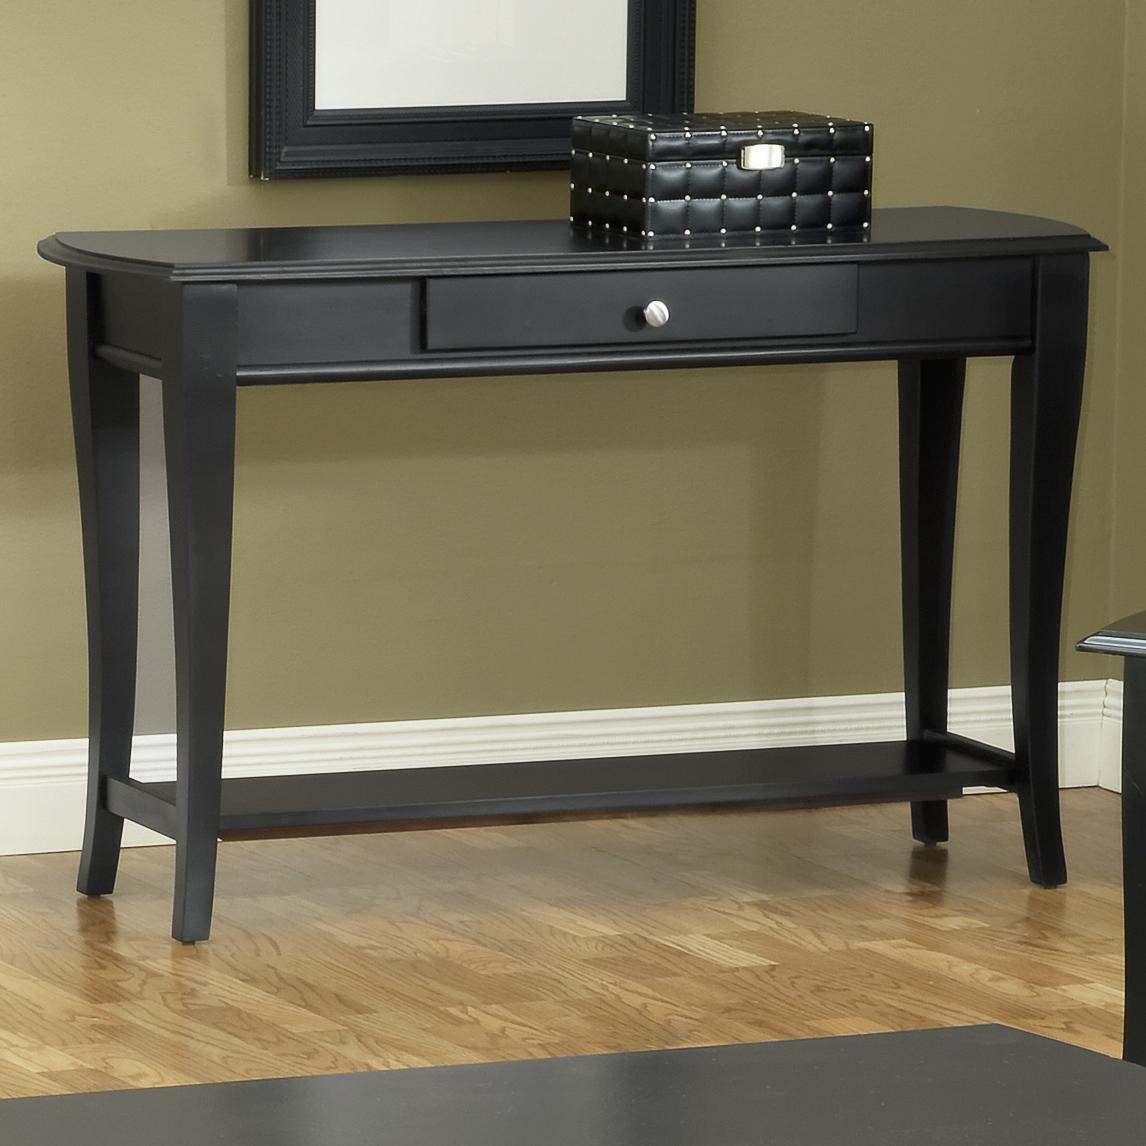 Bernards Broadway Sofa Table - Item Number: 8109